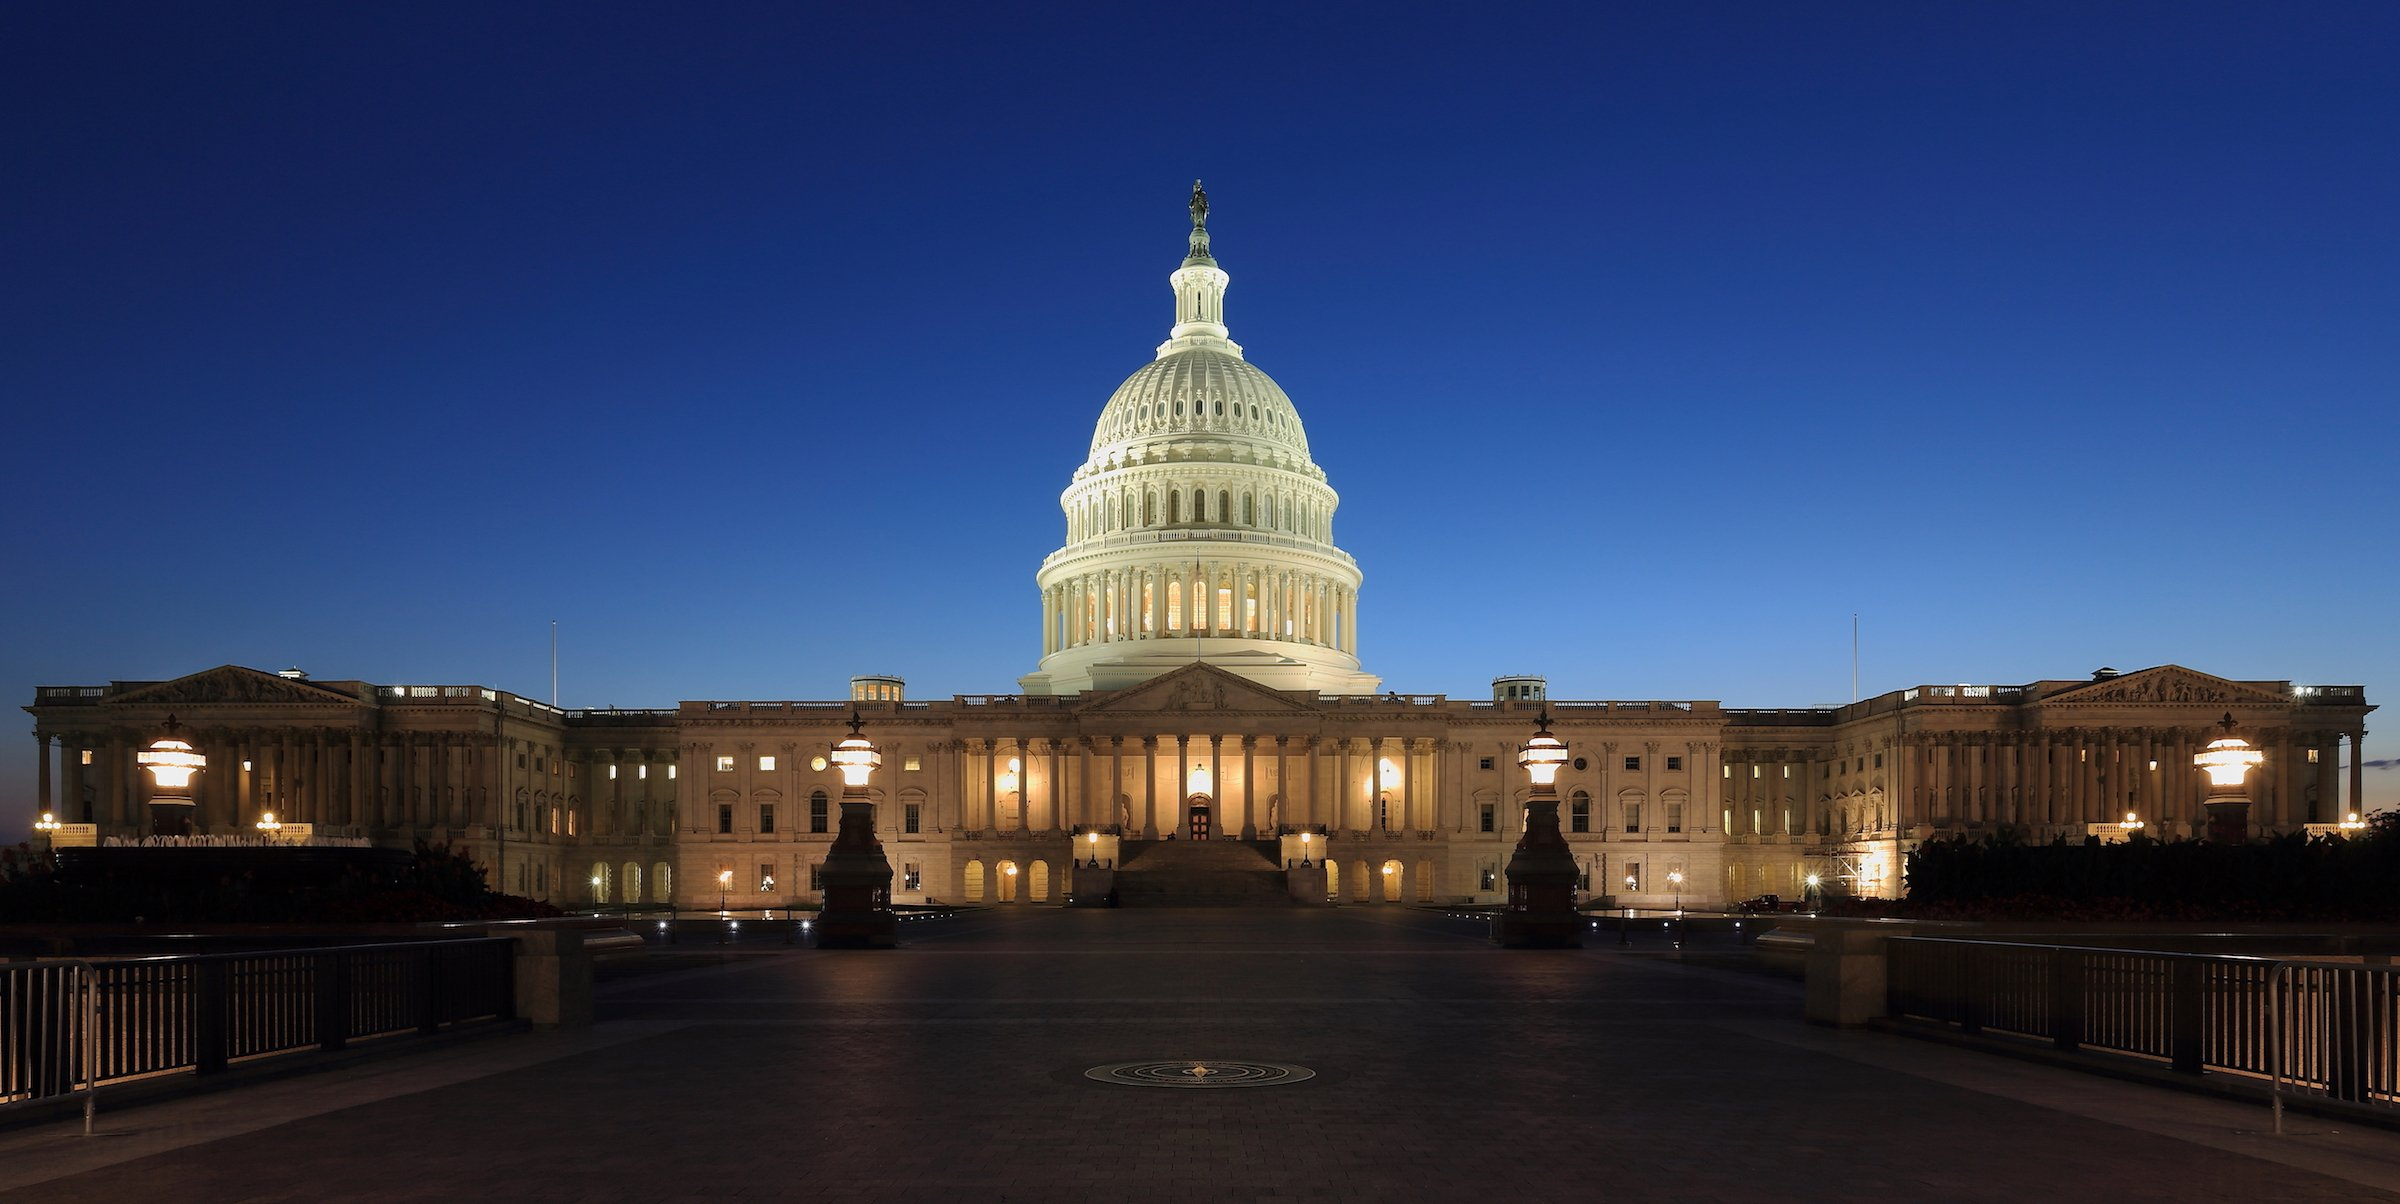 Bipartisanship Down 30% Since 1989